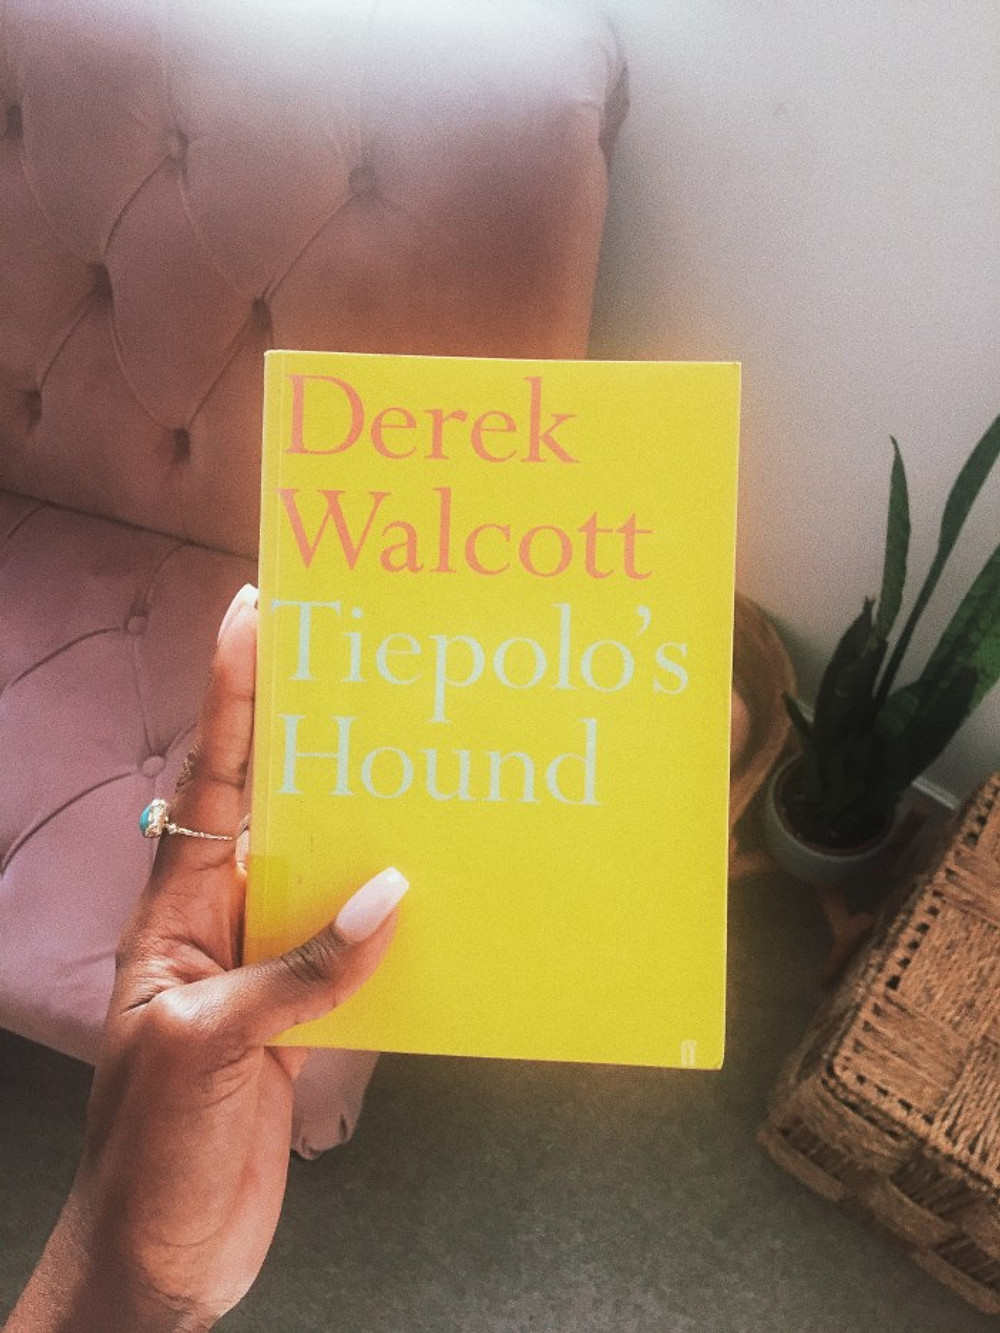 Derek walcott Tiepolo's hound what I'm reading